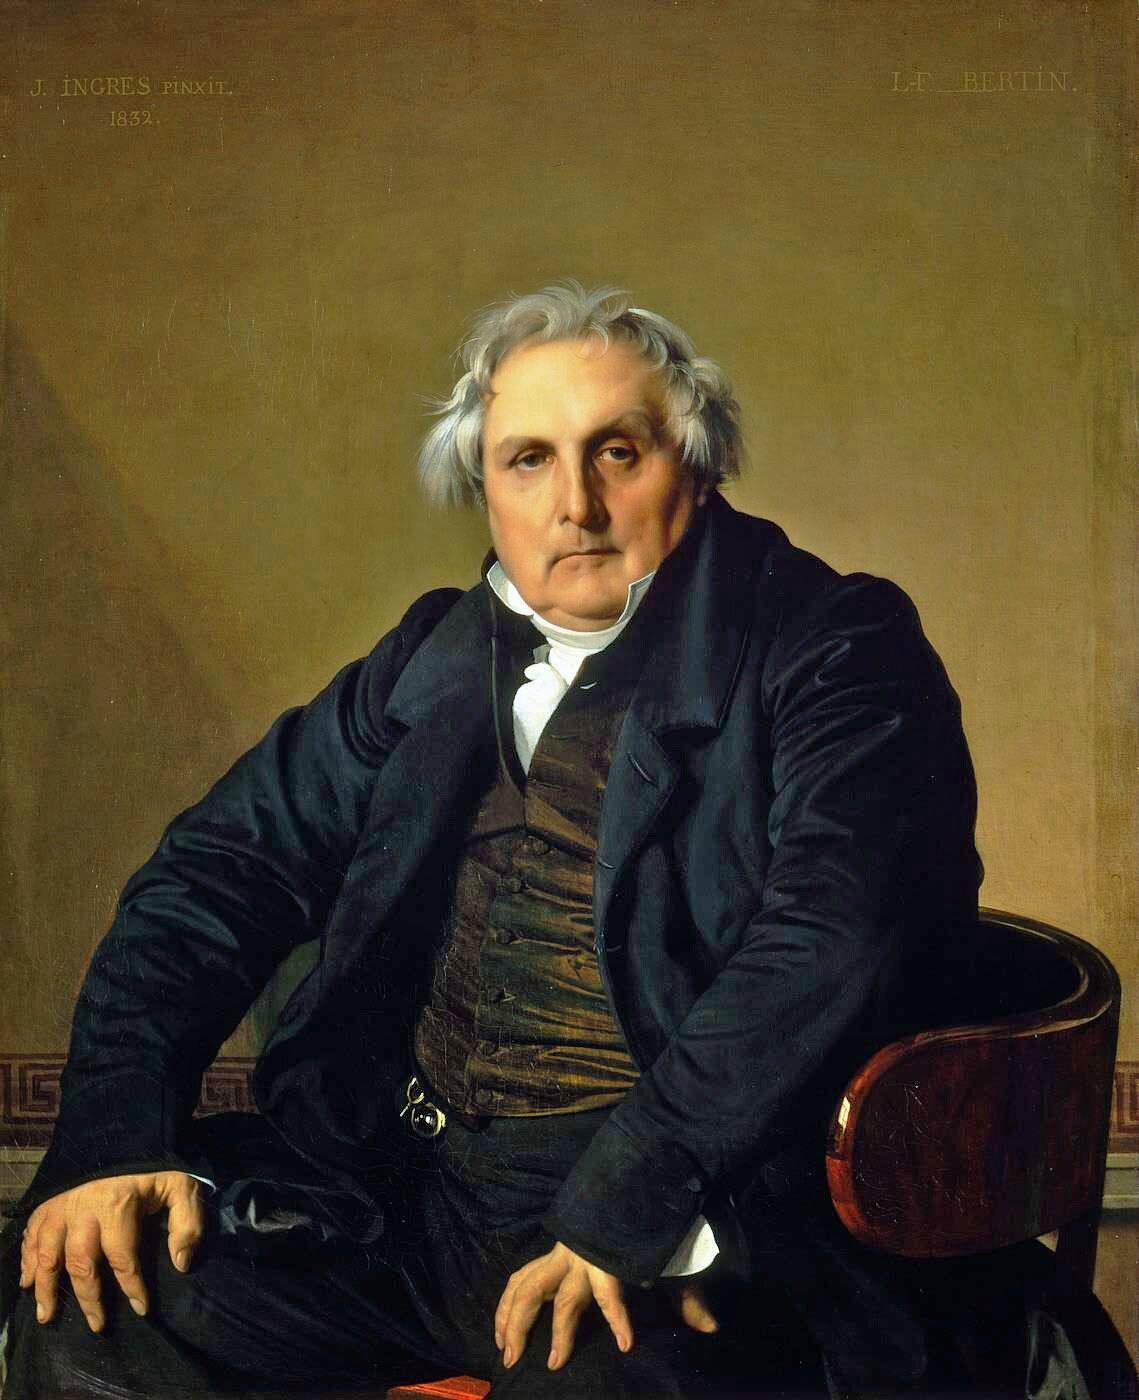 Jean-Auguste-Dominique Ingres - Portrait of French journalist Louis-François Bertin 1832